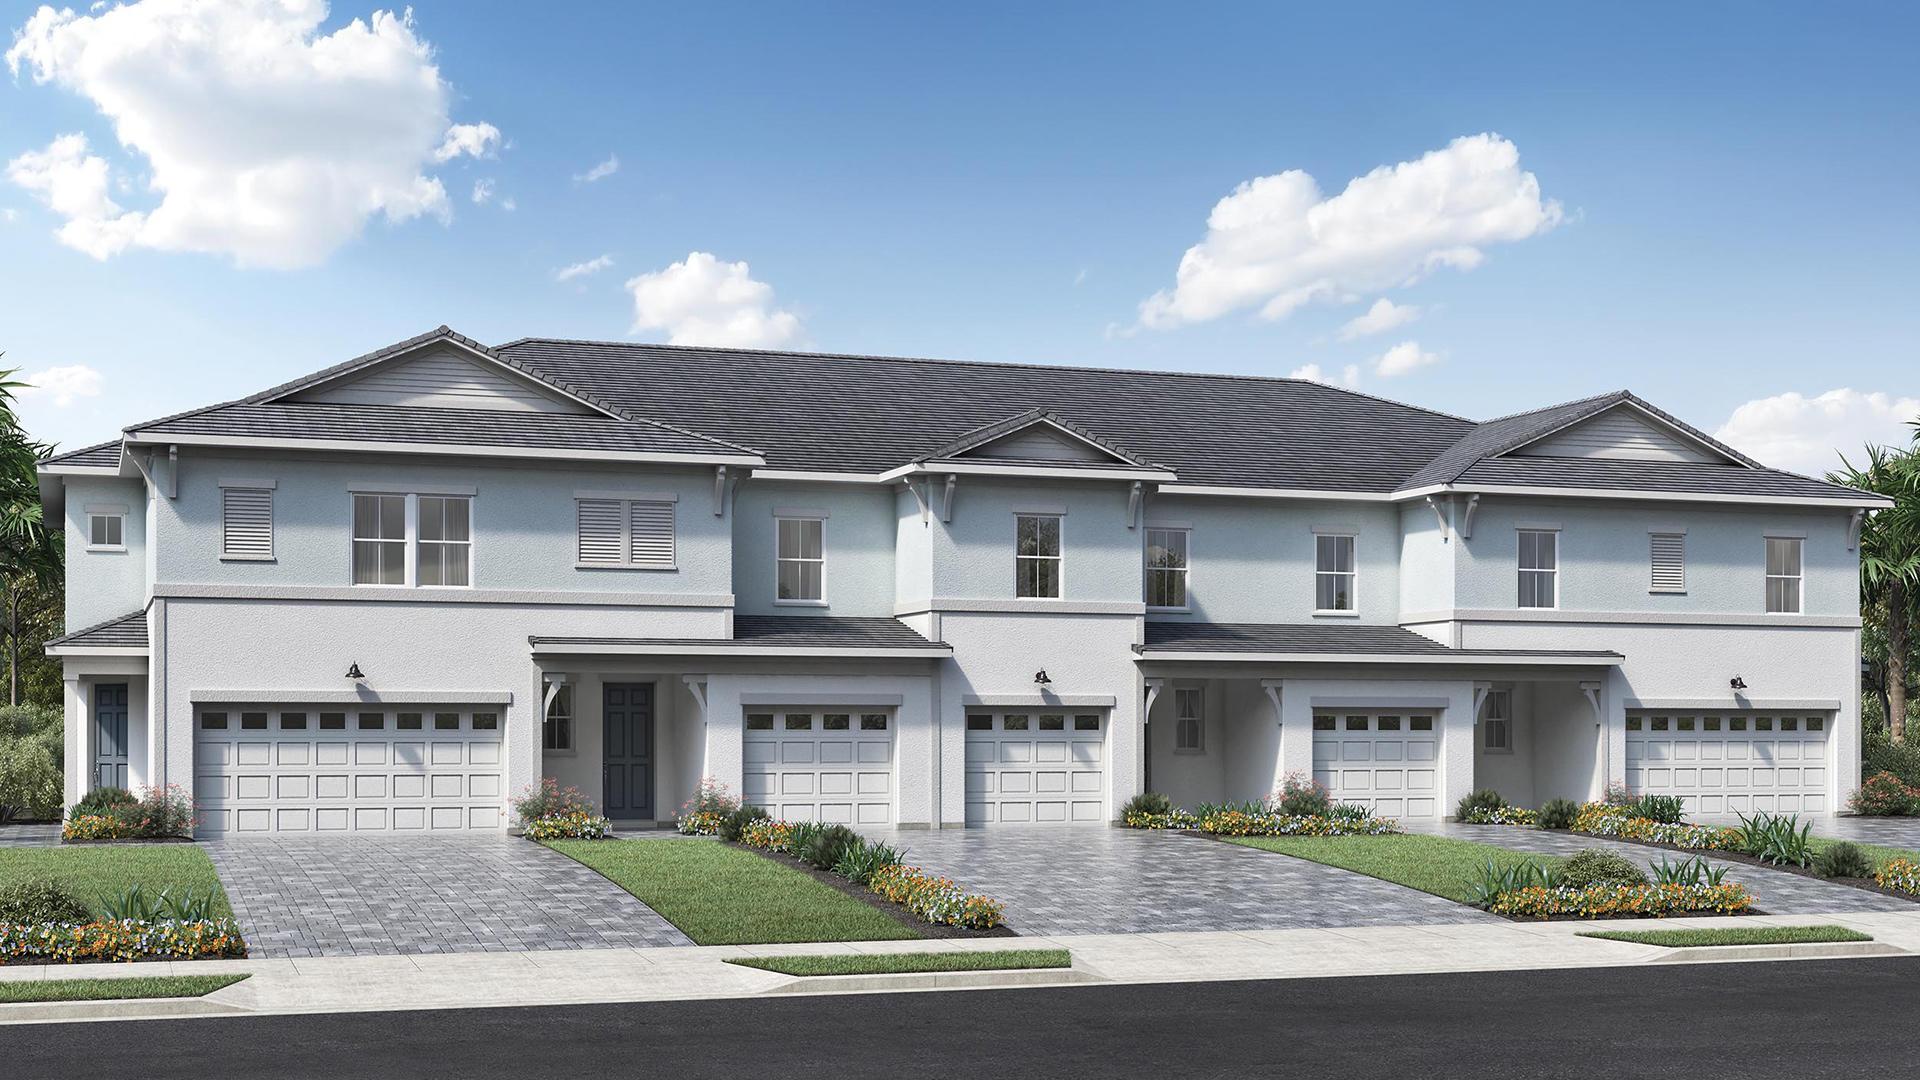 Photo of 501 Spoonbill Terrace, Deerfield Beach, FL 33442